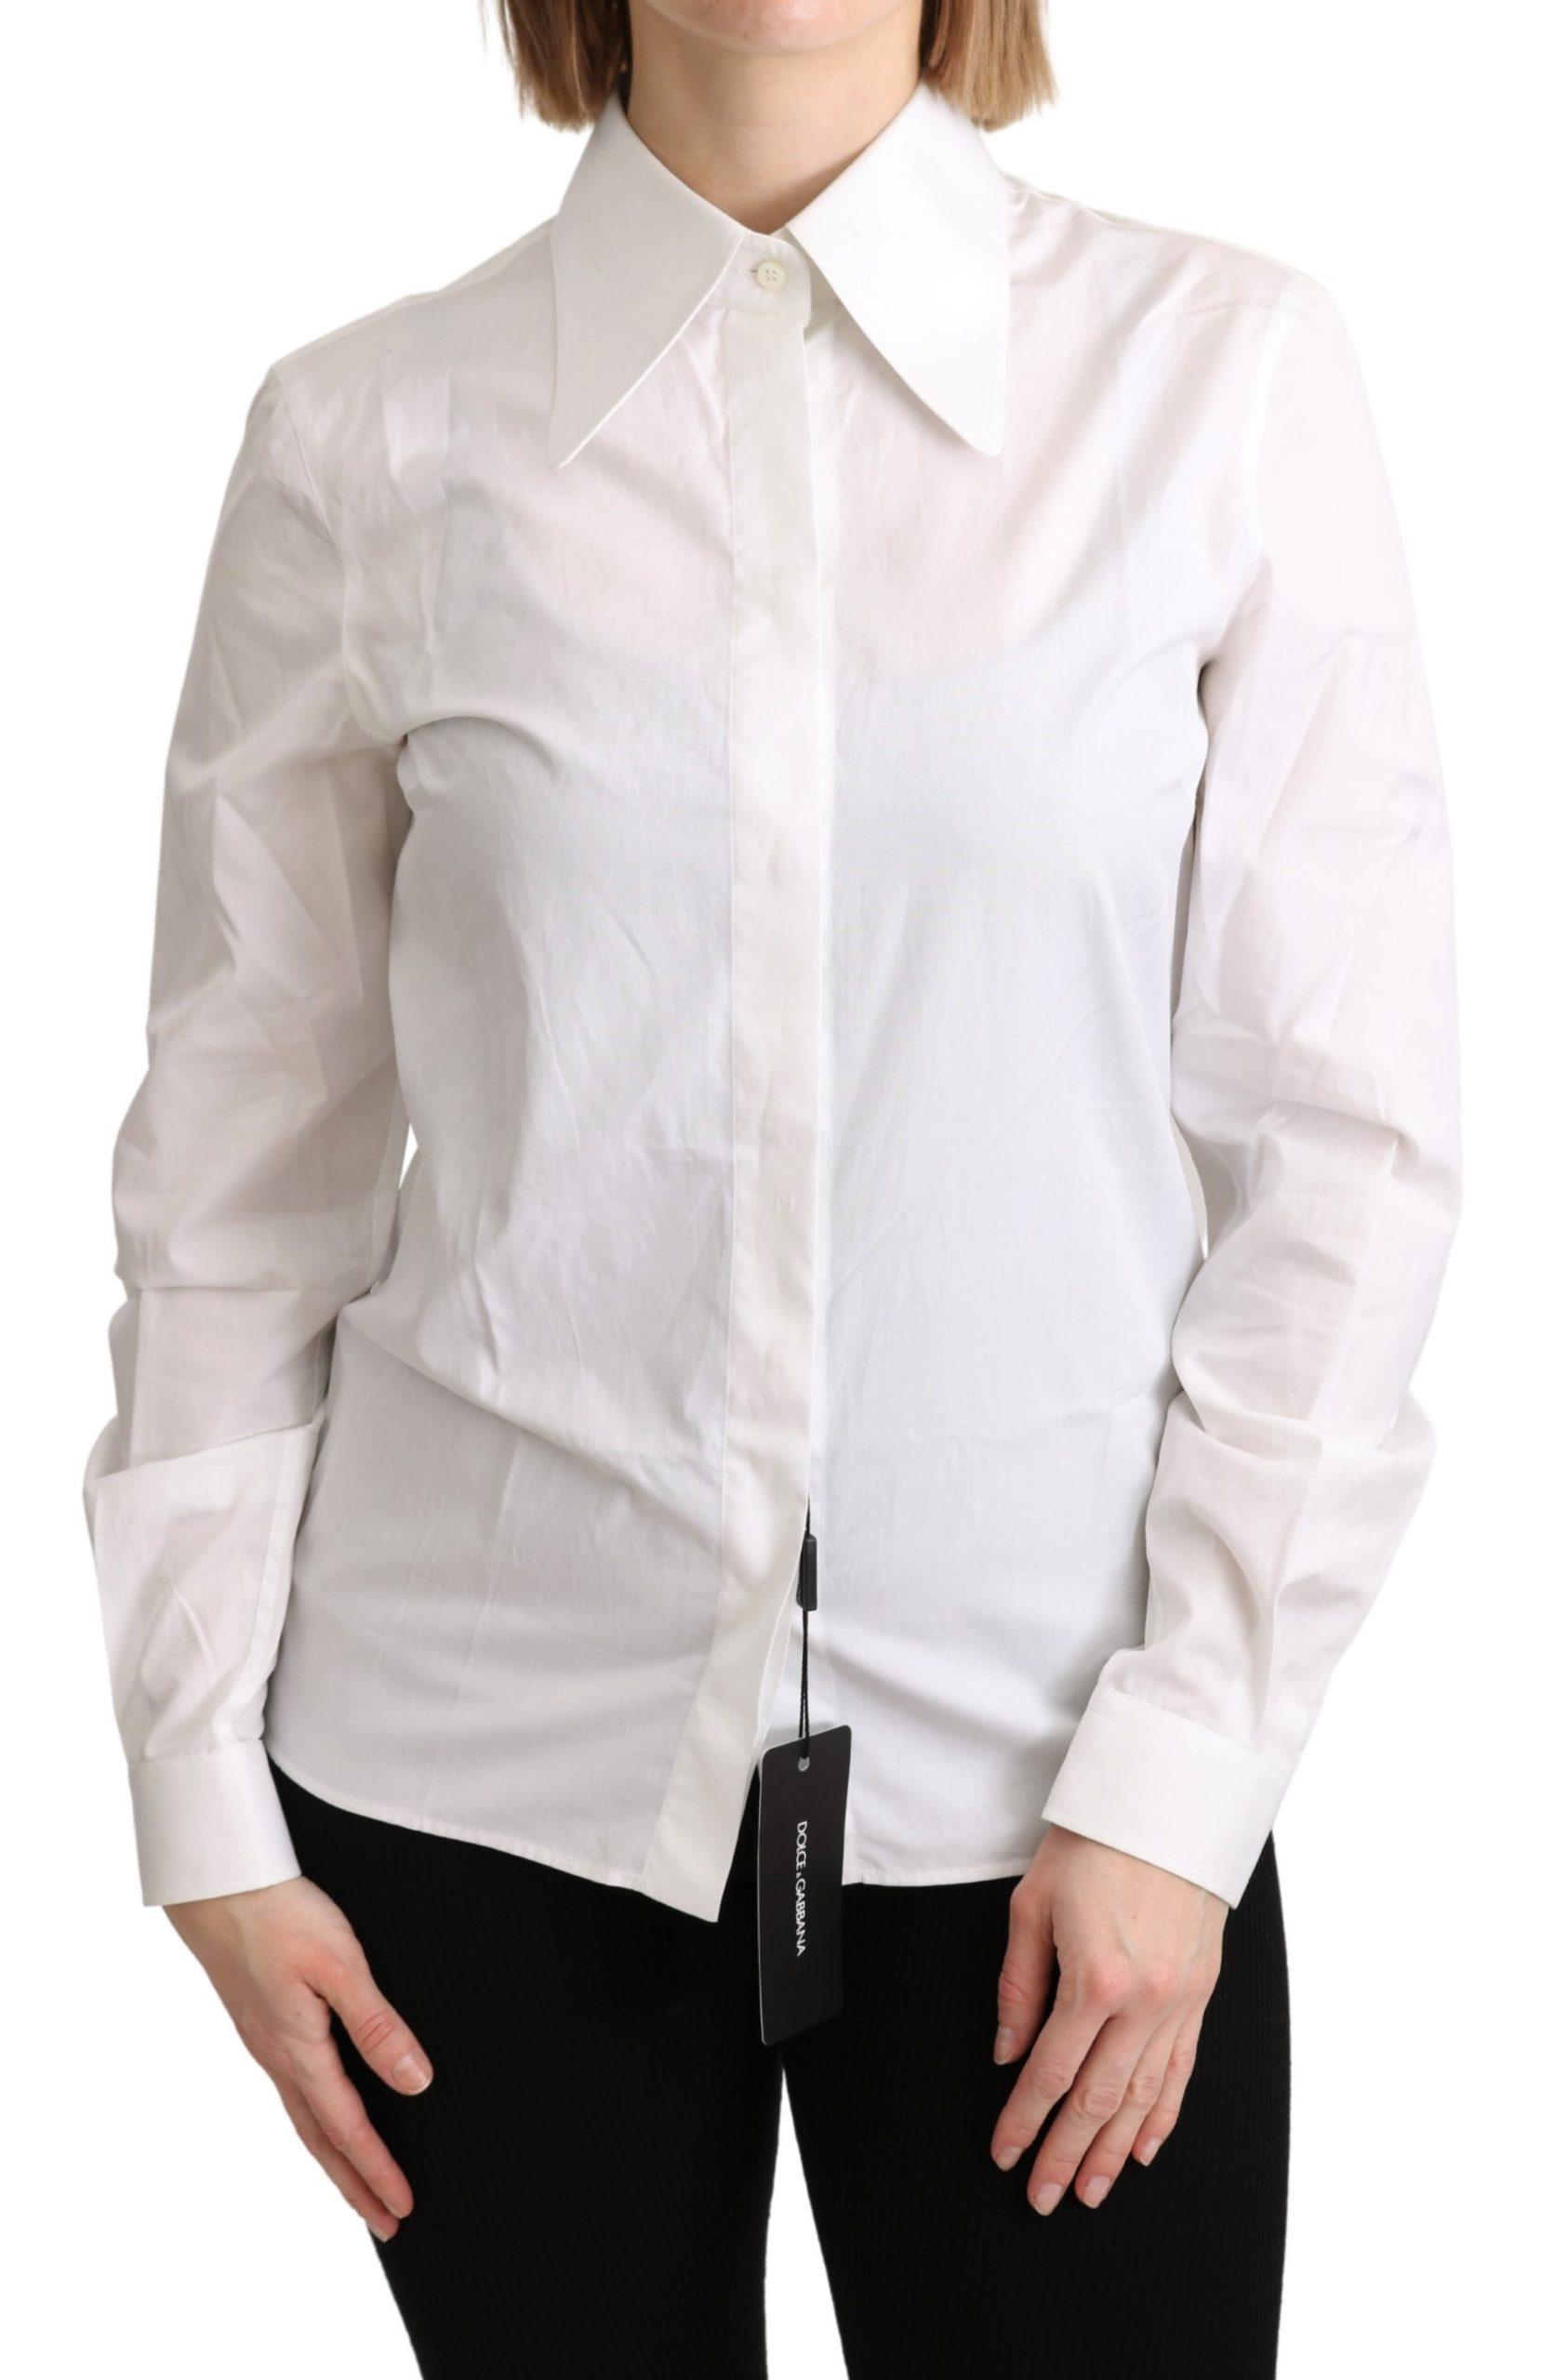 Dolce & Gabbana Women's Collared Formal Dress White TSH5057 - IT40 S